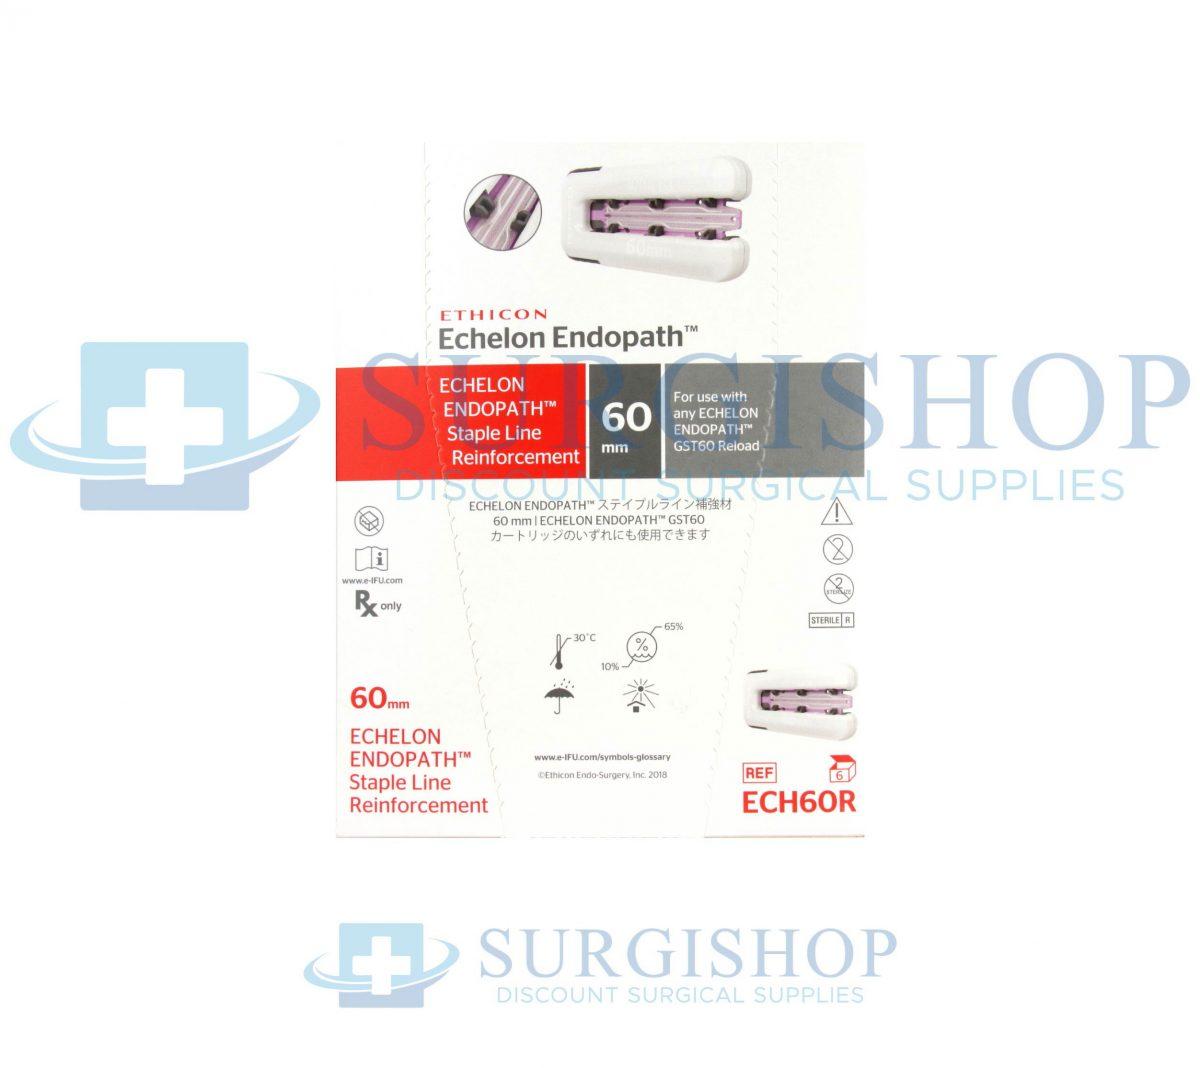 Ethicon Echelon Endopath Staple Line Reinforcement